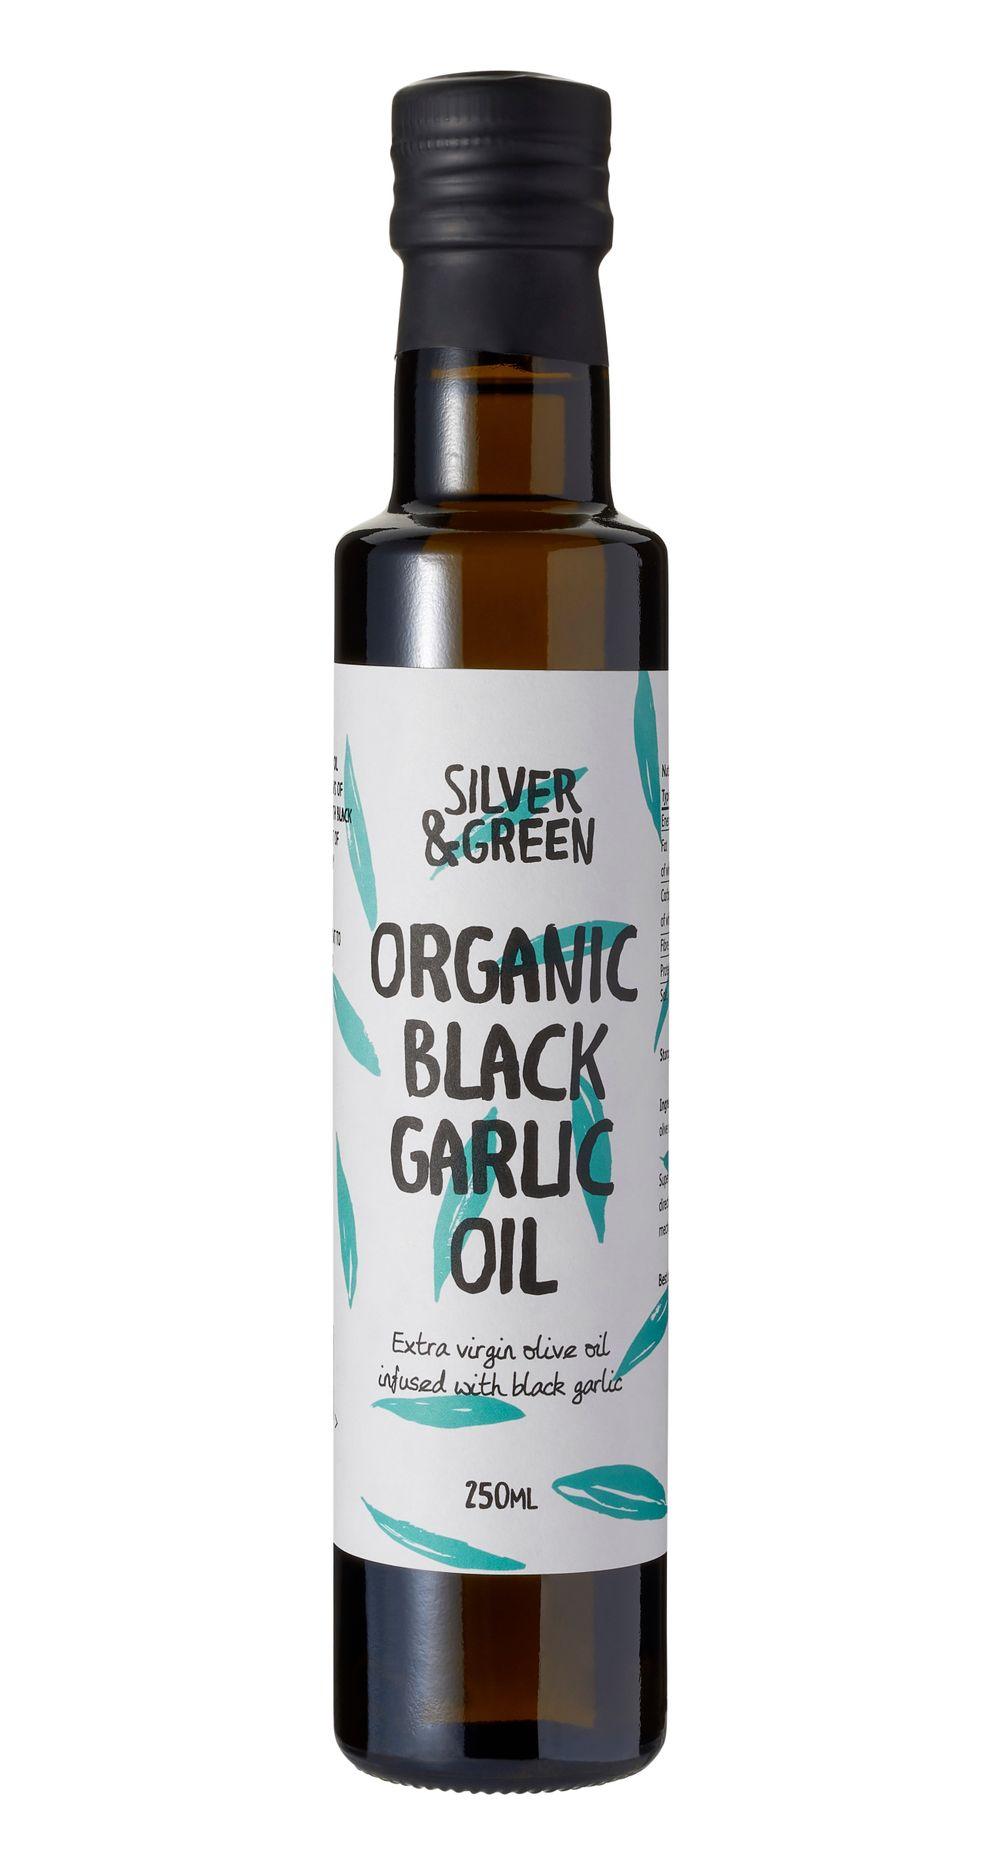 Organic Black Garlic Oil